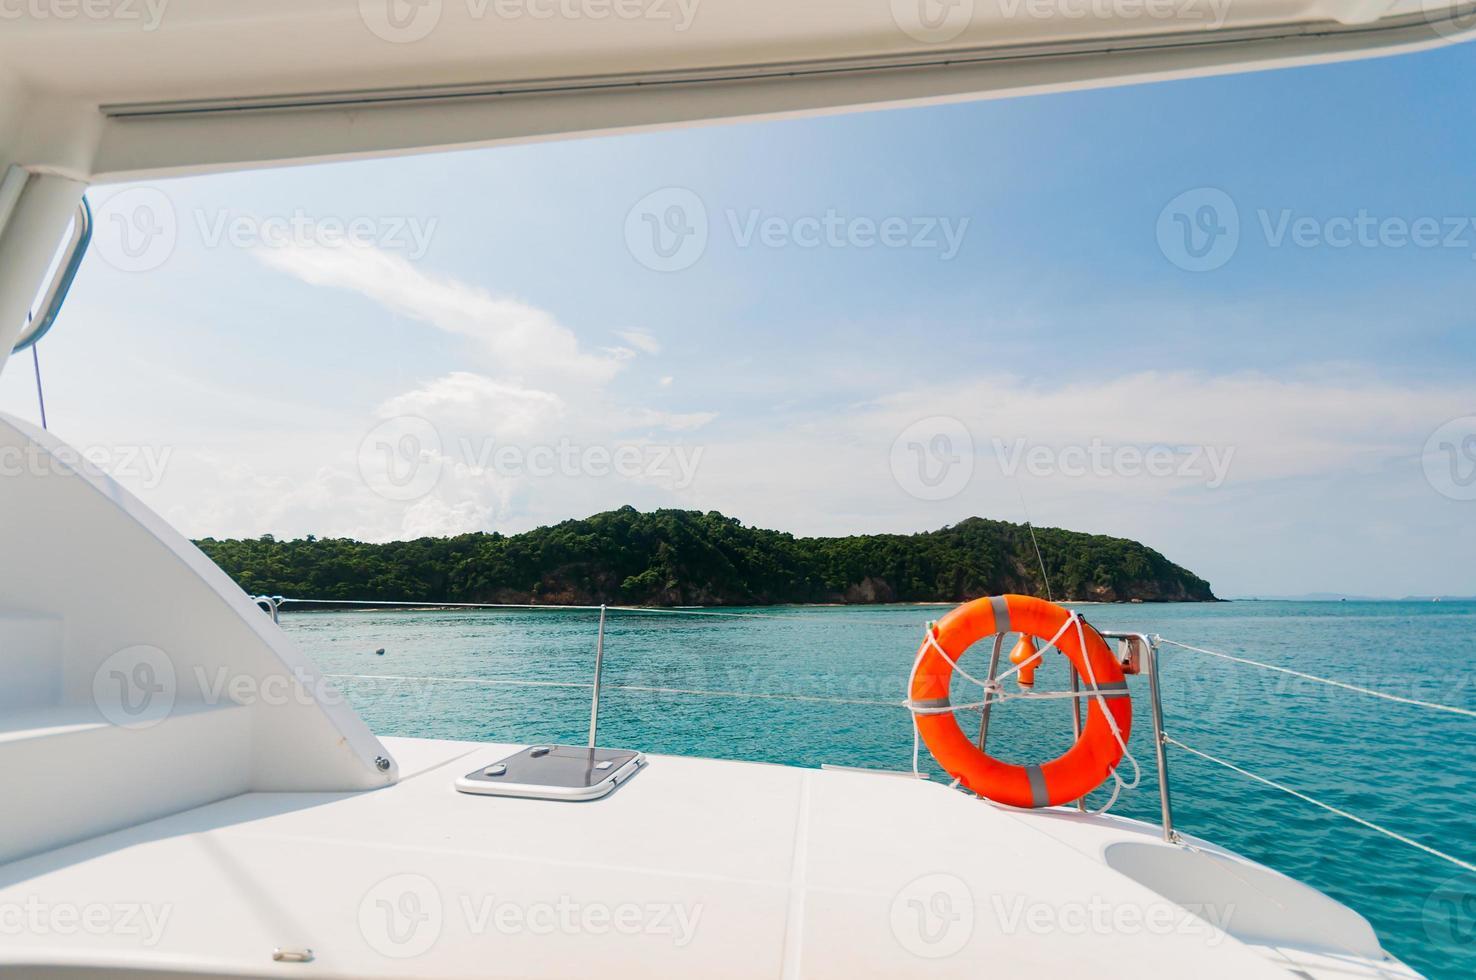 barco catamarã privado flutuando perto da ilha. estilo de vida luxuoso foto